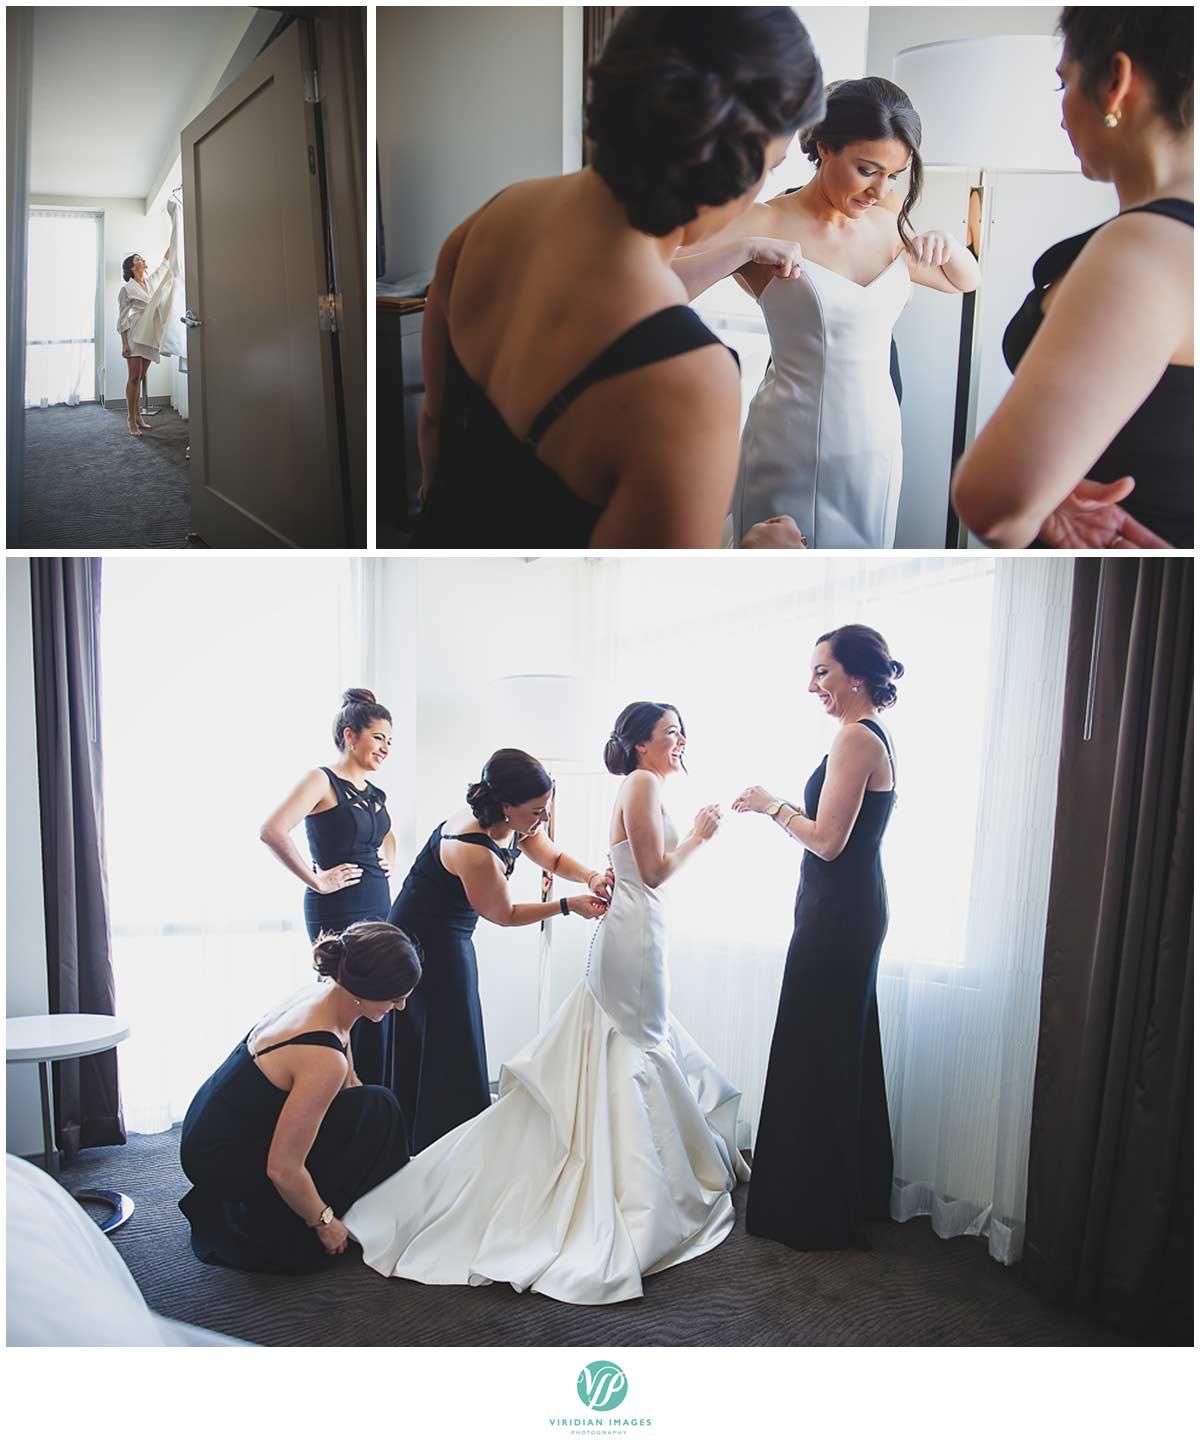 Peachtree_Club_Atlanta_Wedding_Viridian_Images_Photography-8